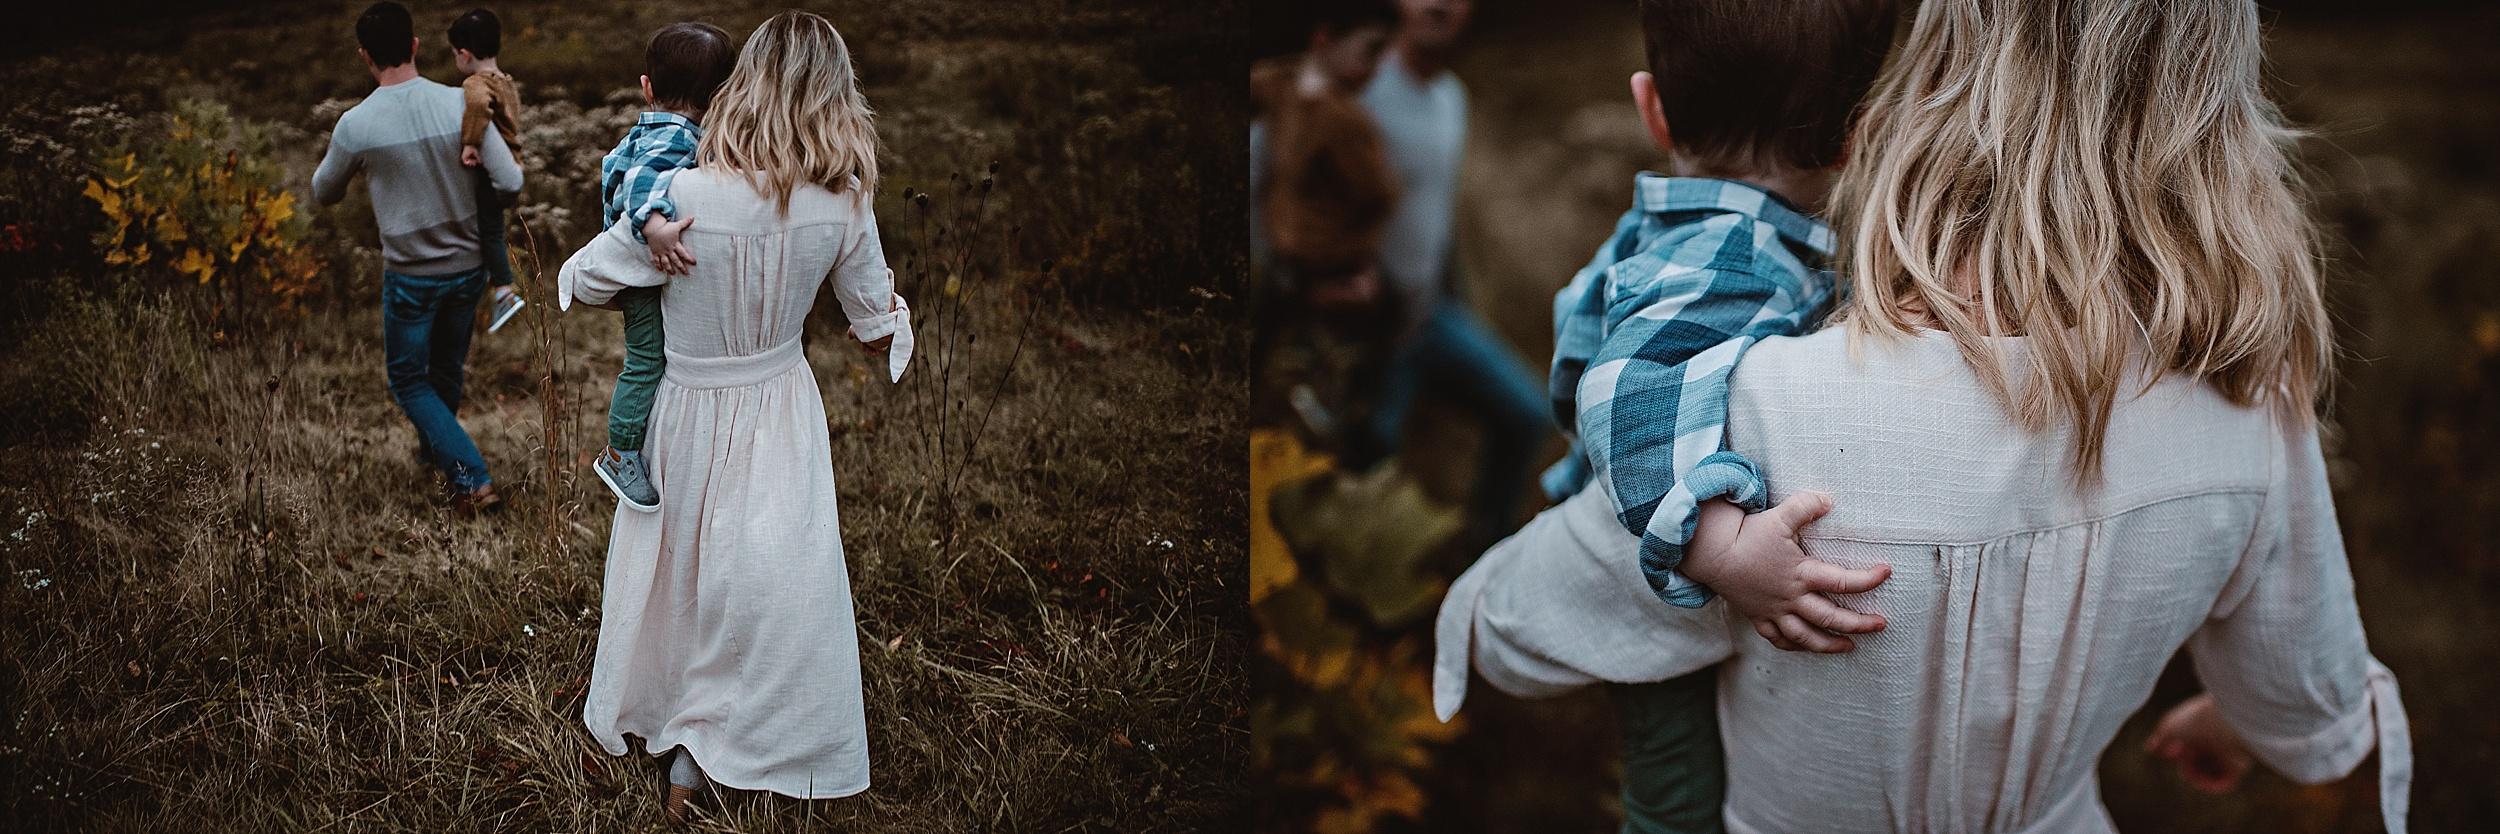 lauren-grayson-photography-portrait-artist-akron-cleveland-ohio-photographer-family-session-fields-sunset-fall_0222.jpg